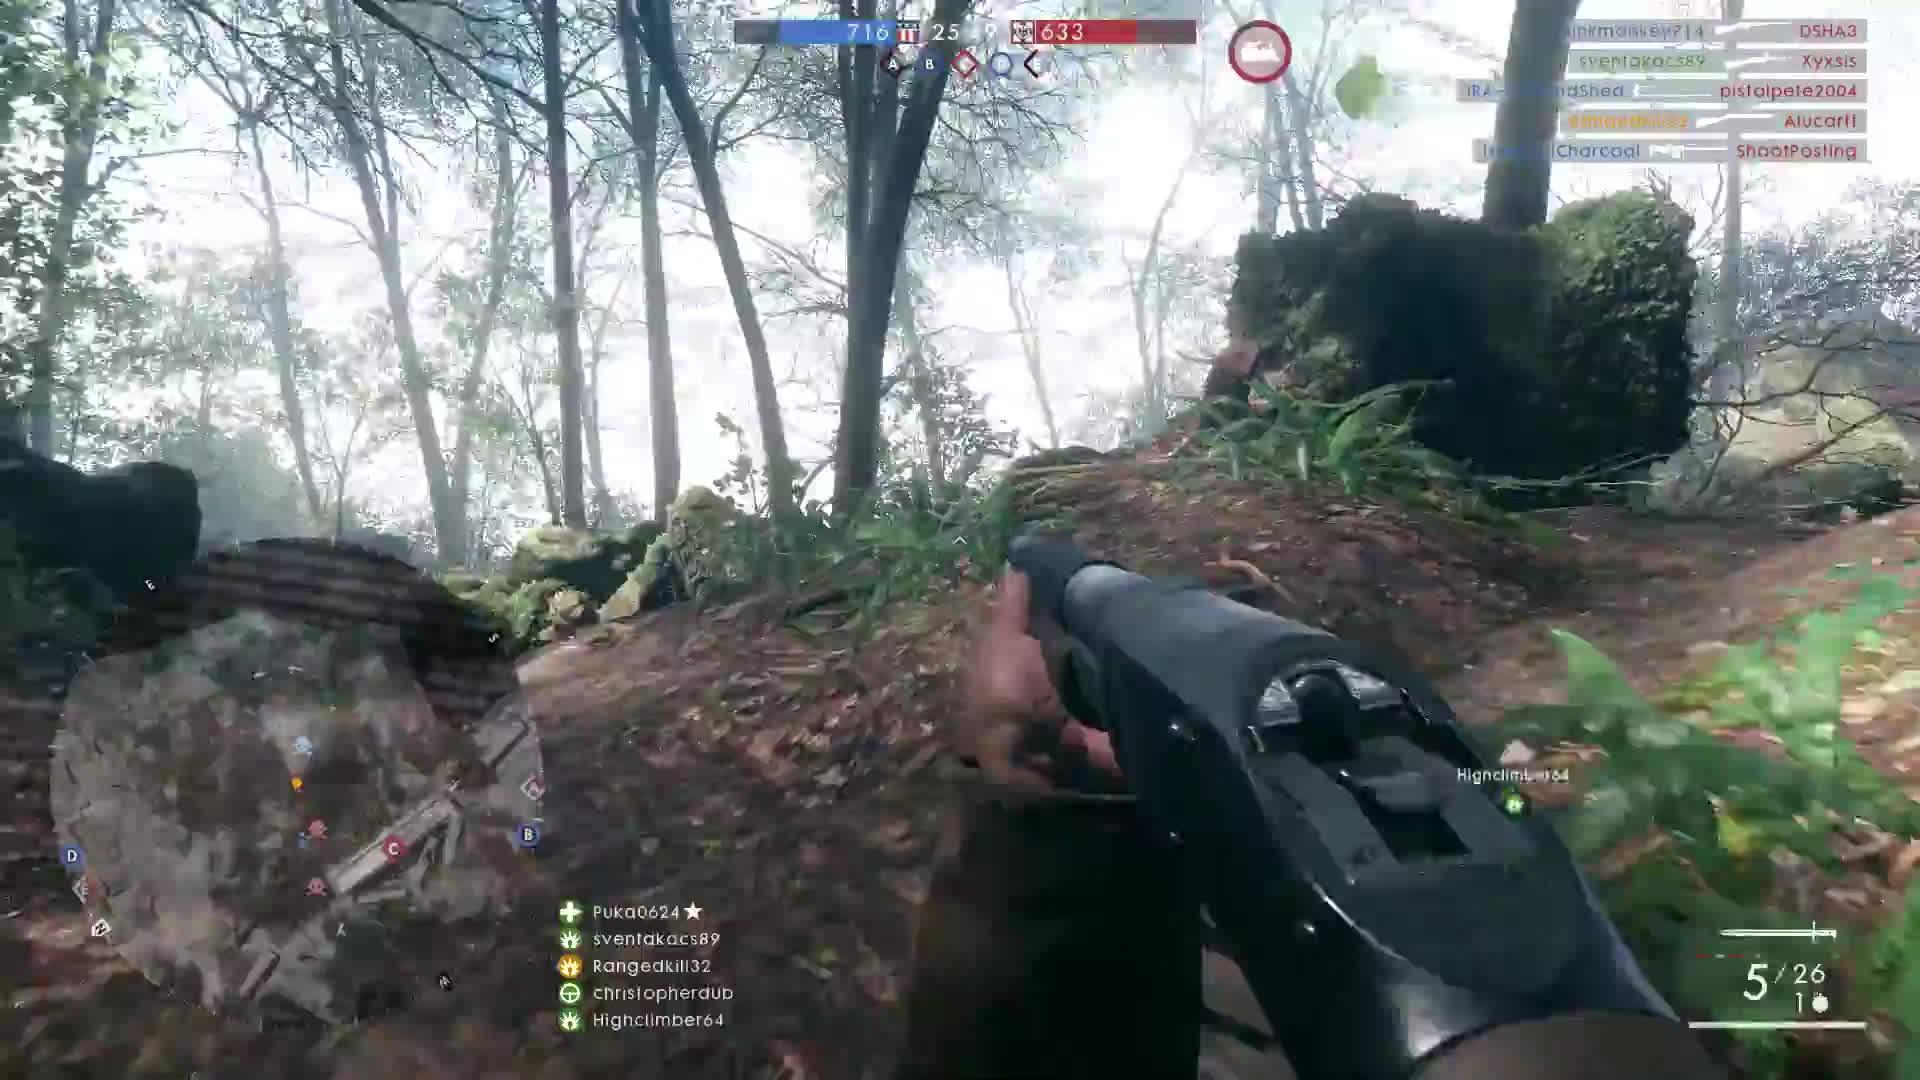 Battlefield giveth, Battlefield taketh away GIFs